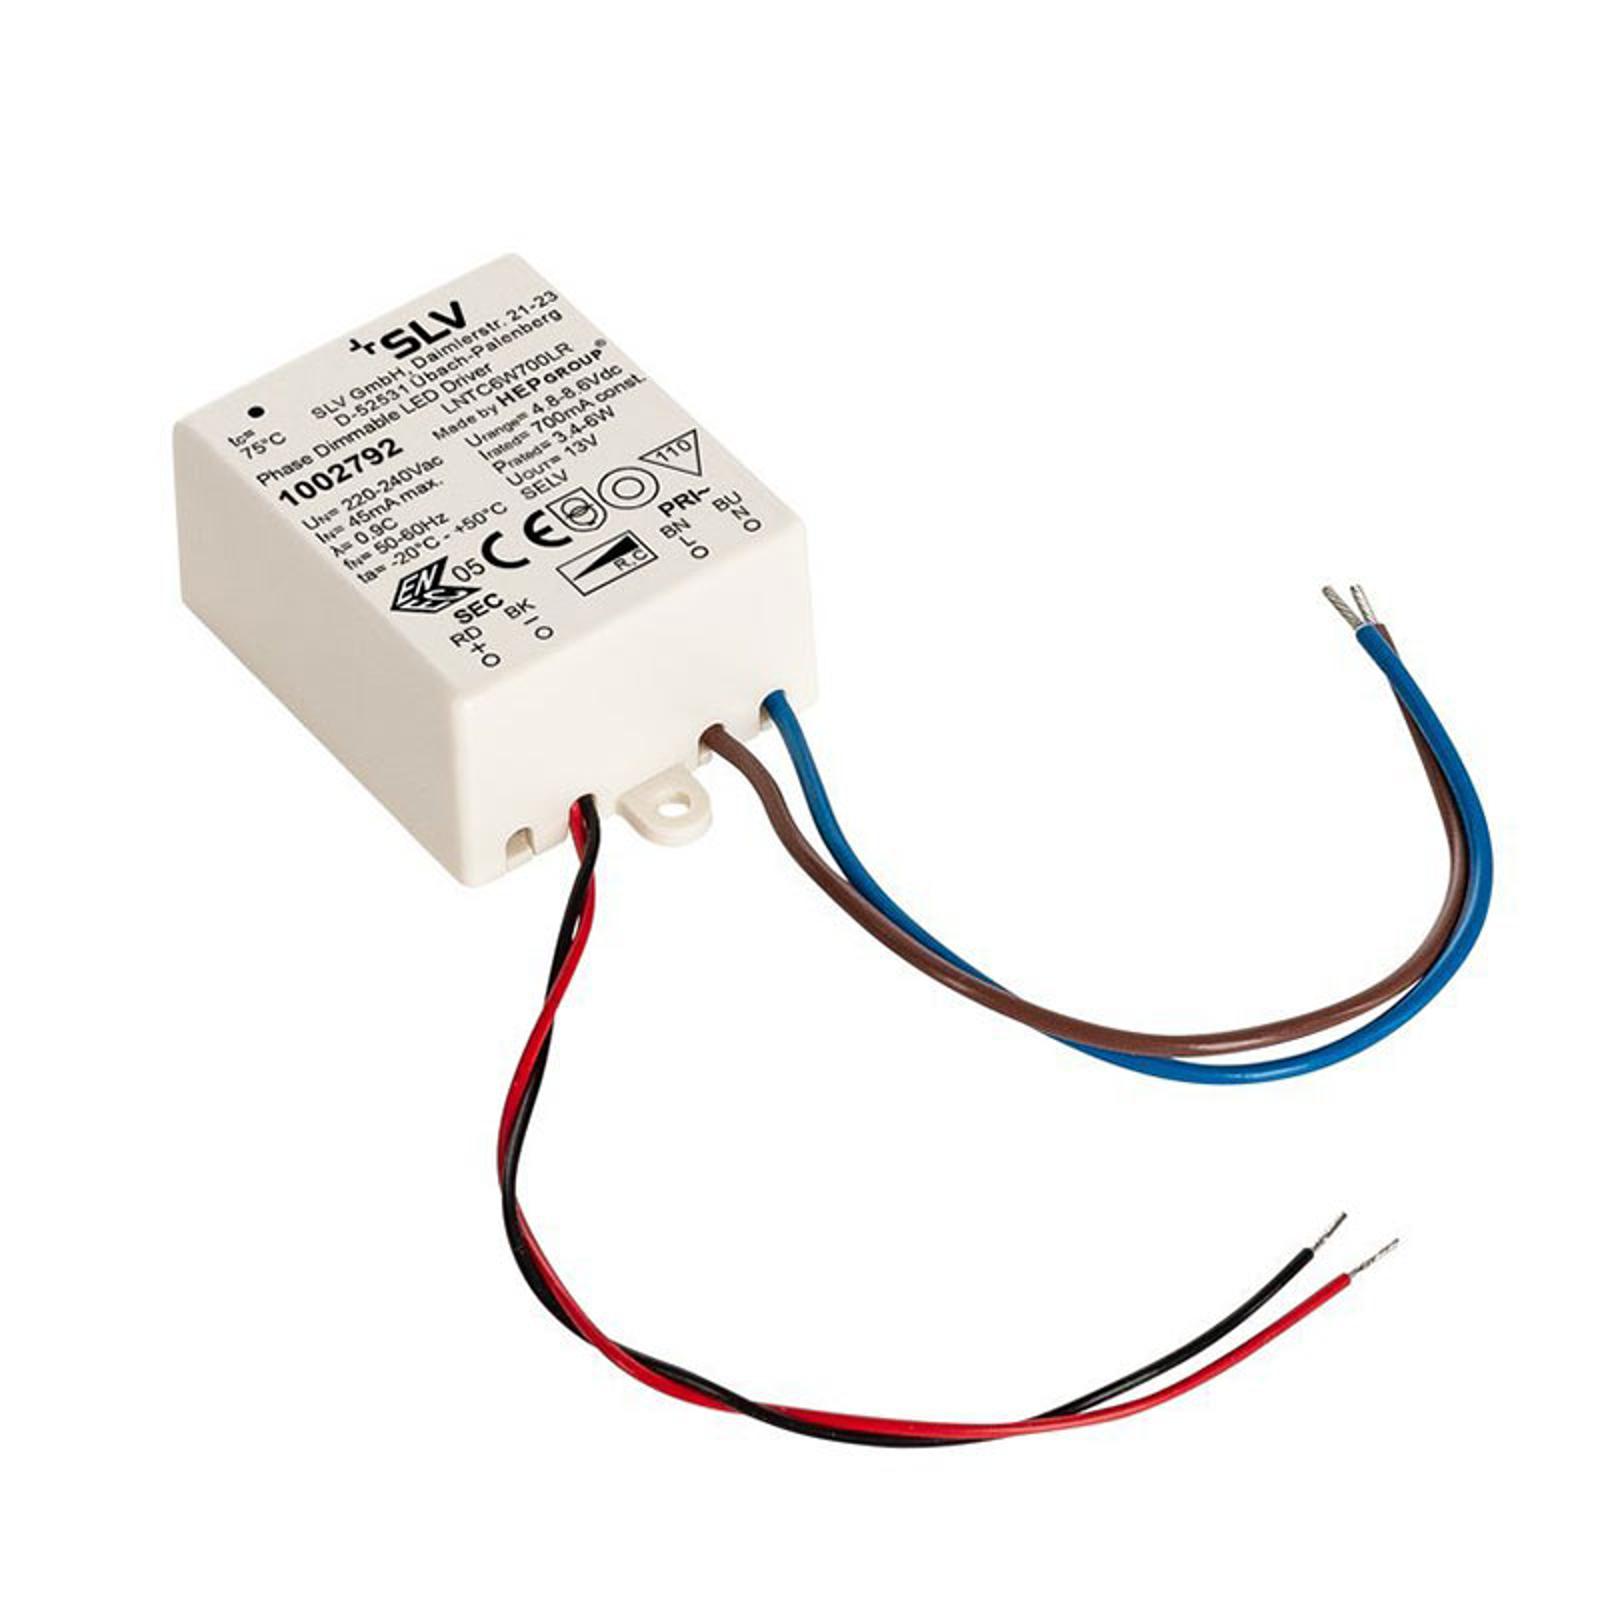 SLV driver LED 6W, 700mA, dimmable TRIAC